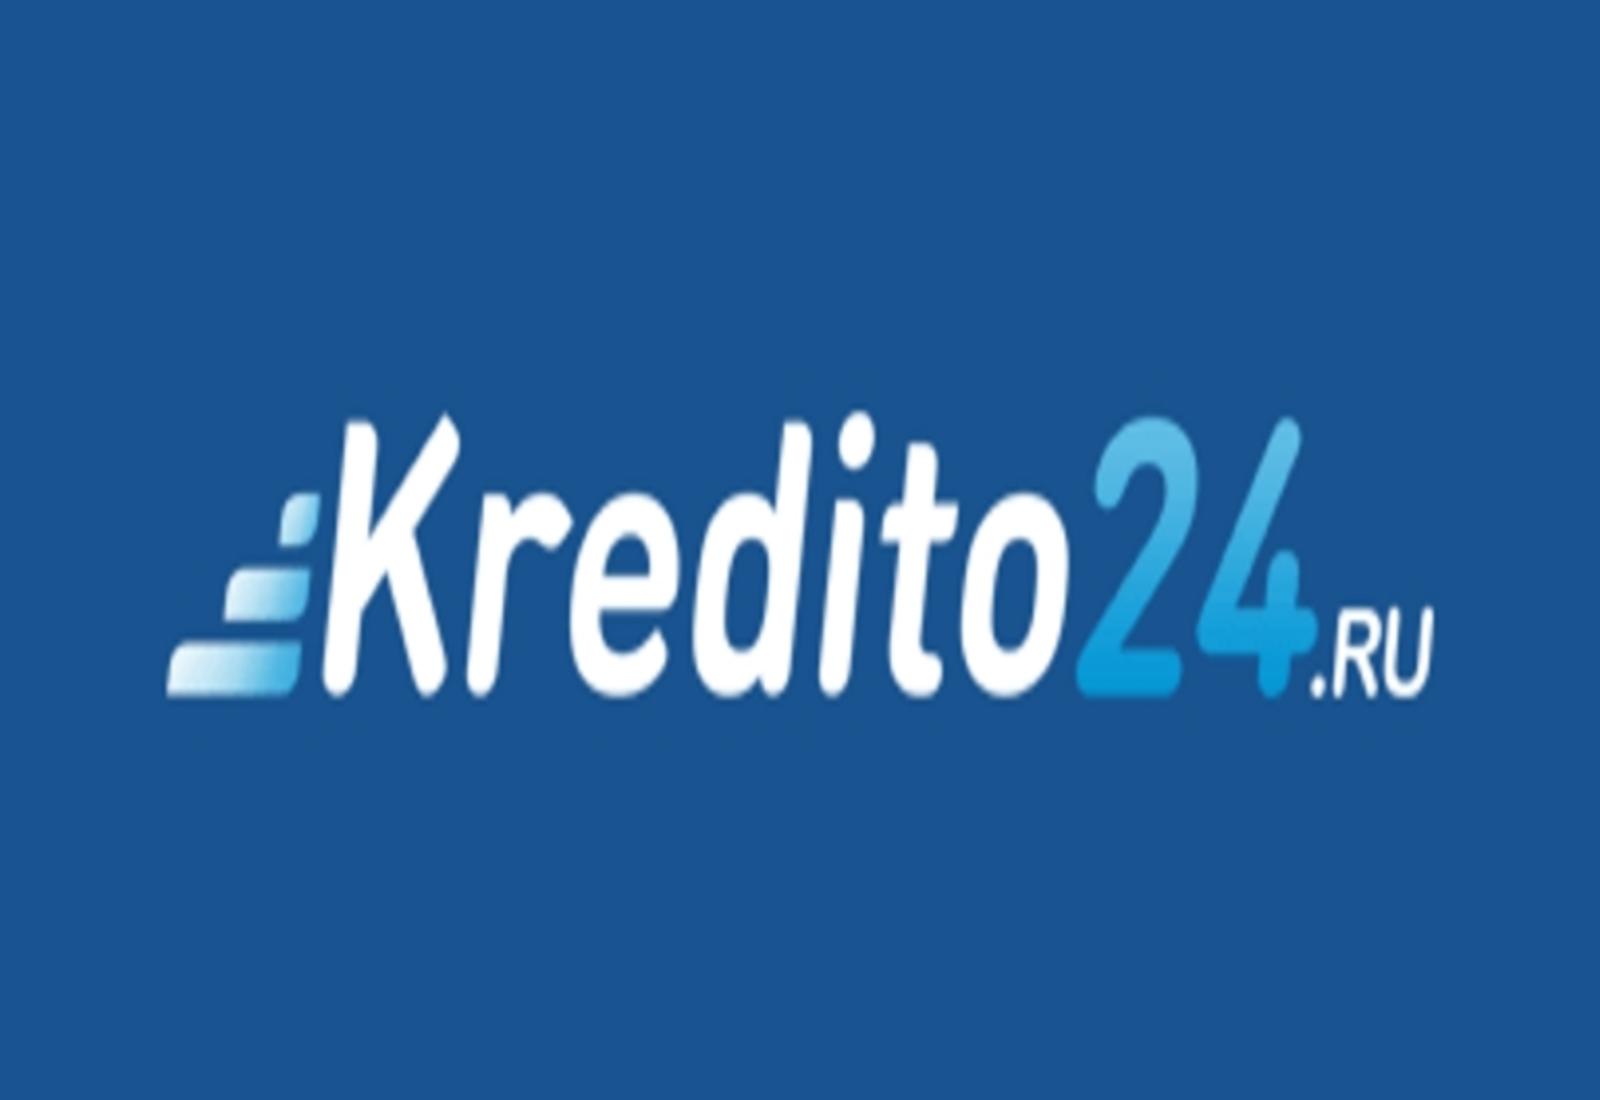 Заим в МФК Kredito24